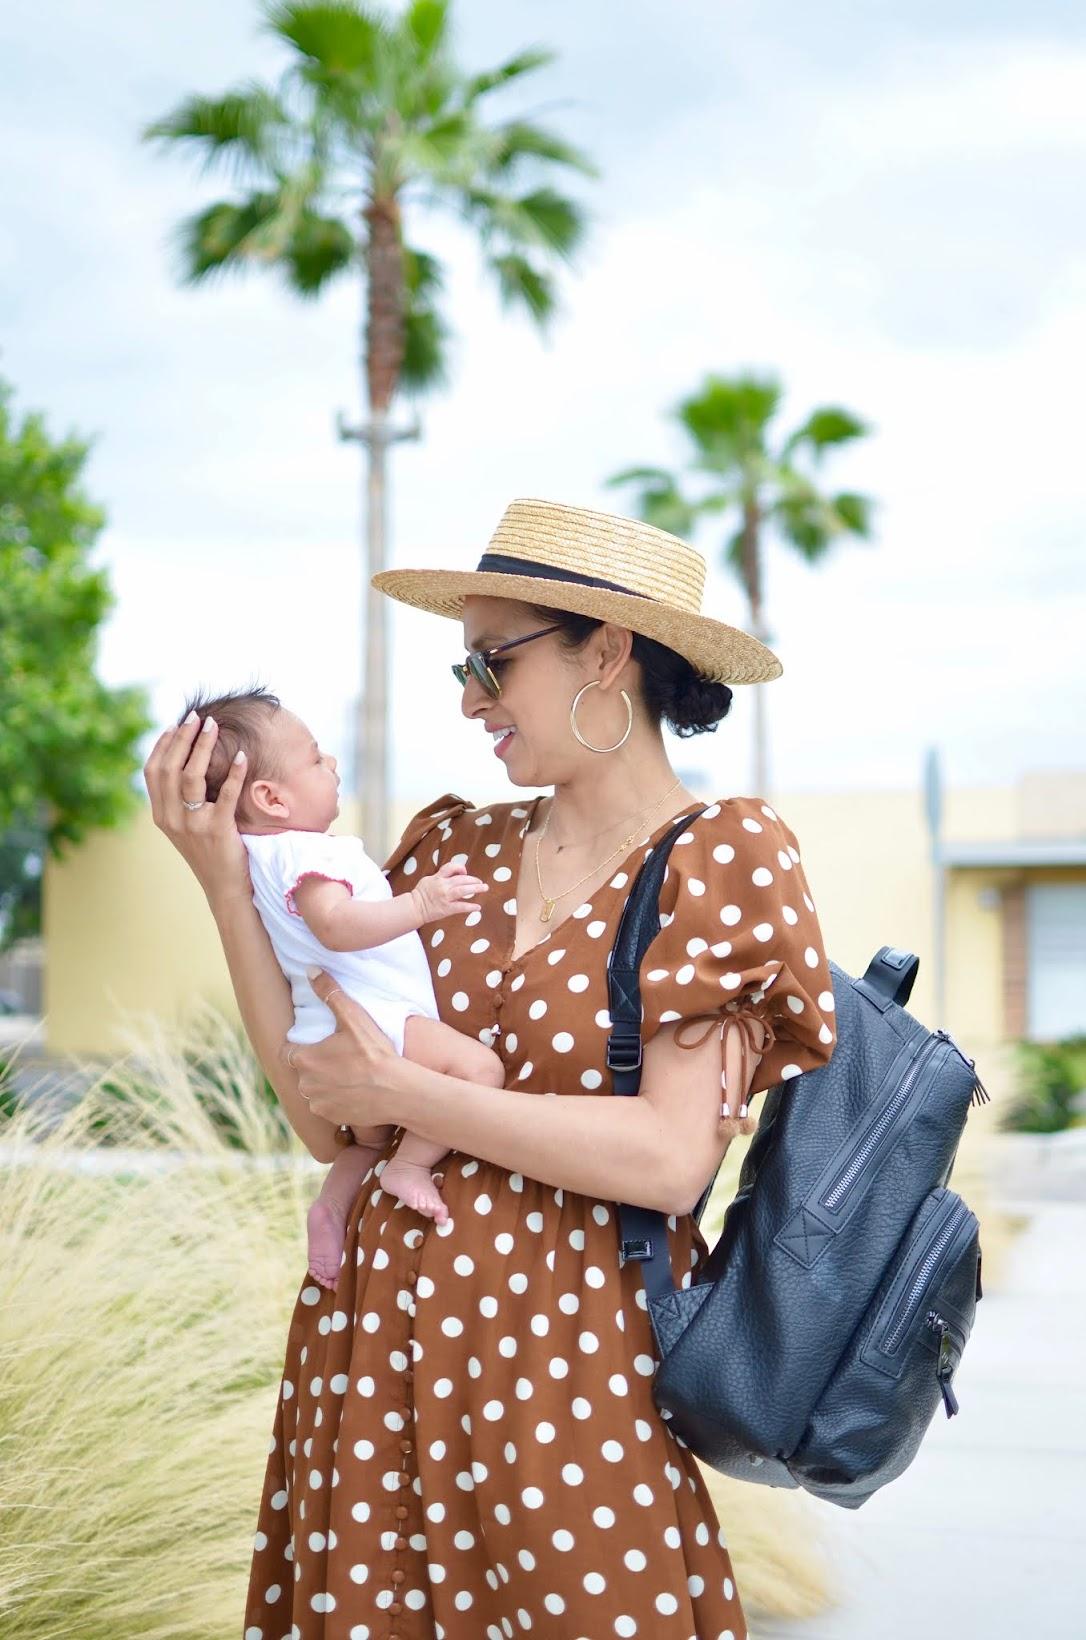 mom style, newborn mom style, Tiba + Marl diaper bag, chicwish, polka dot dress, FarFetch,